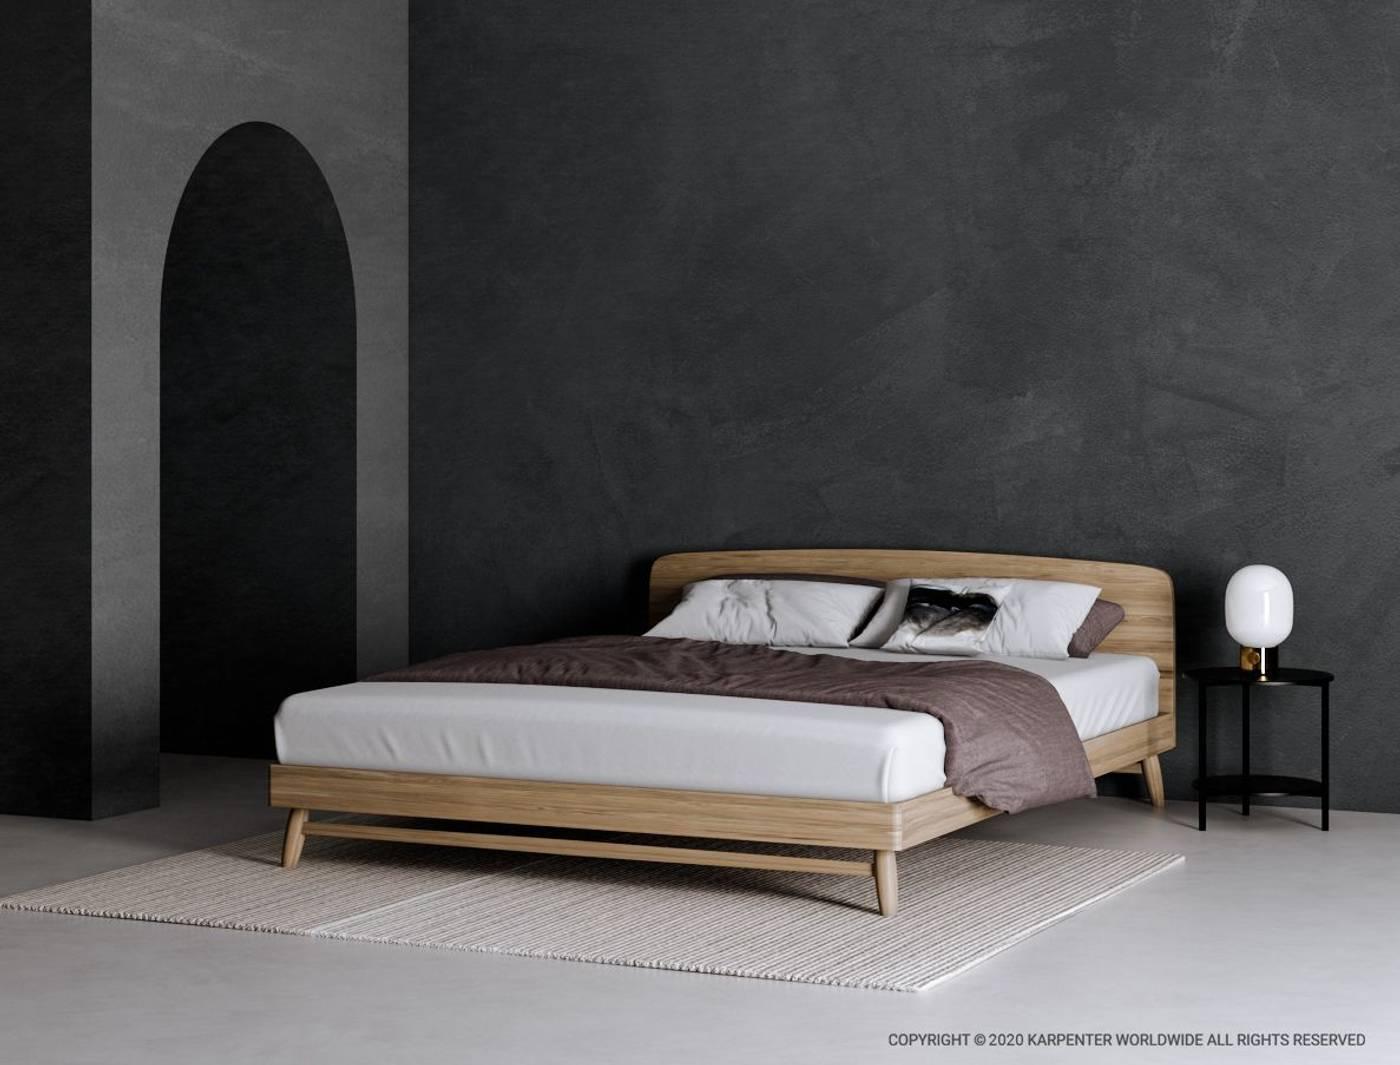 Twist Queen Bed - European Oak